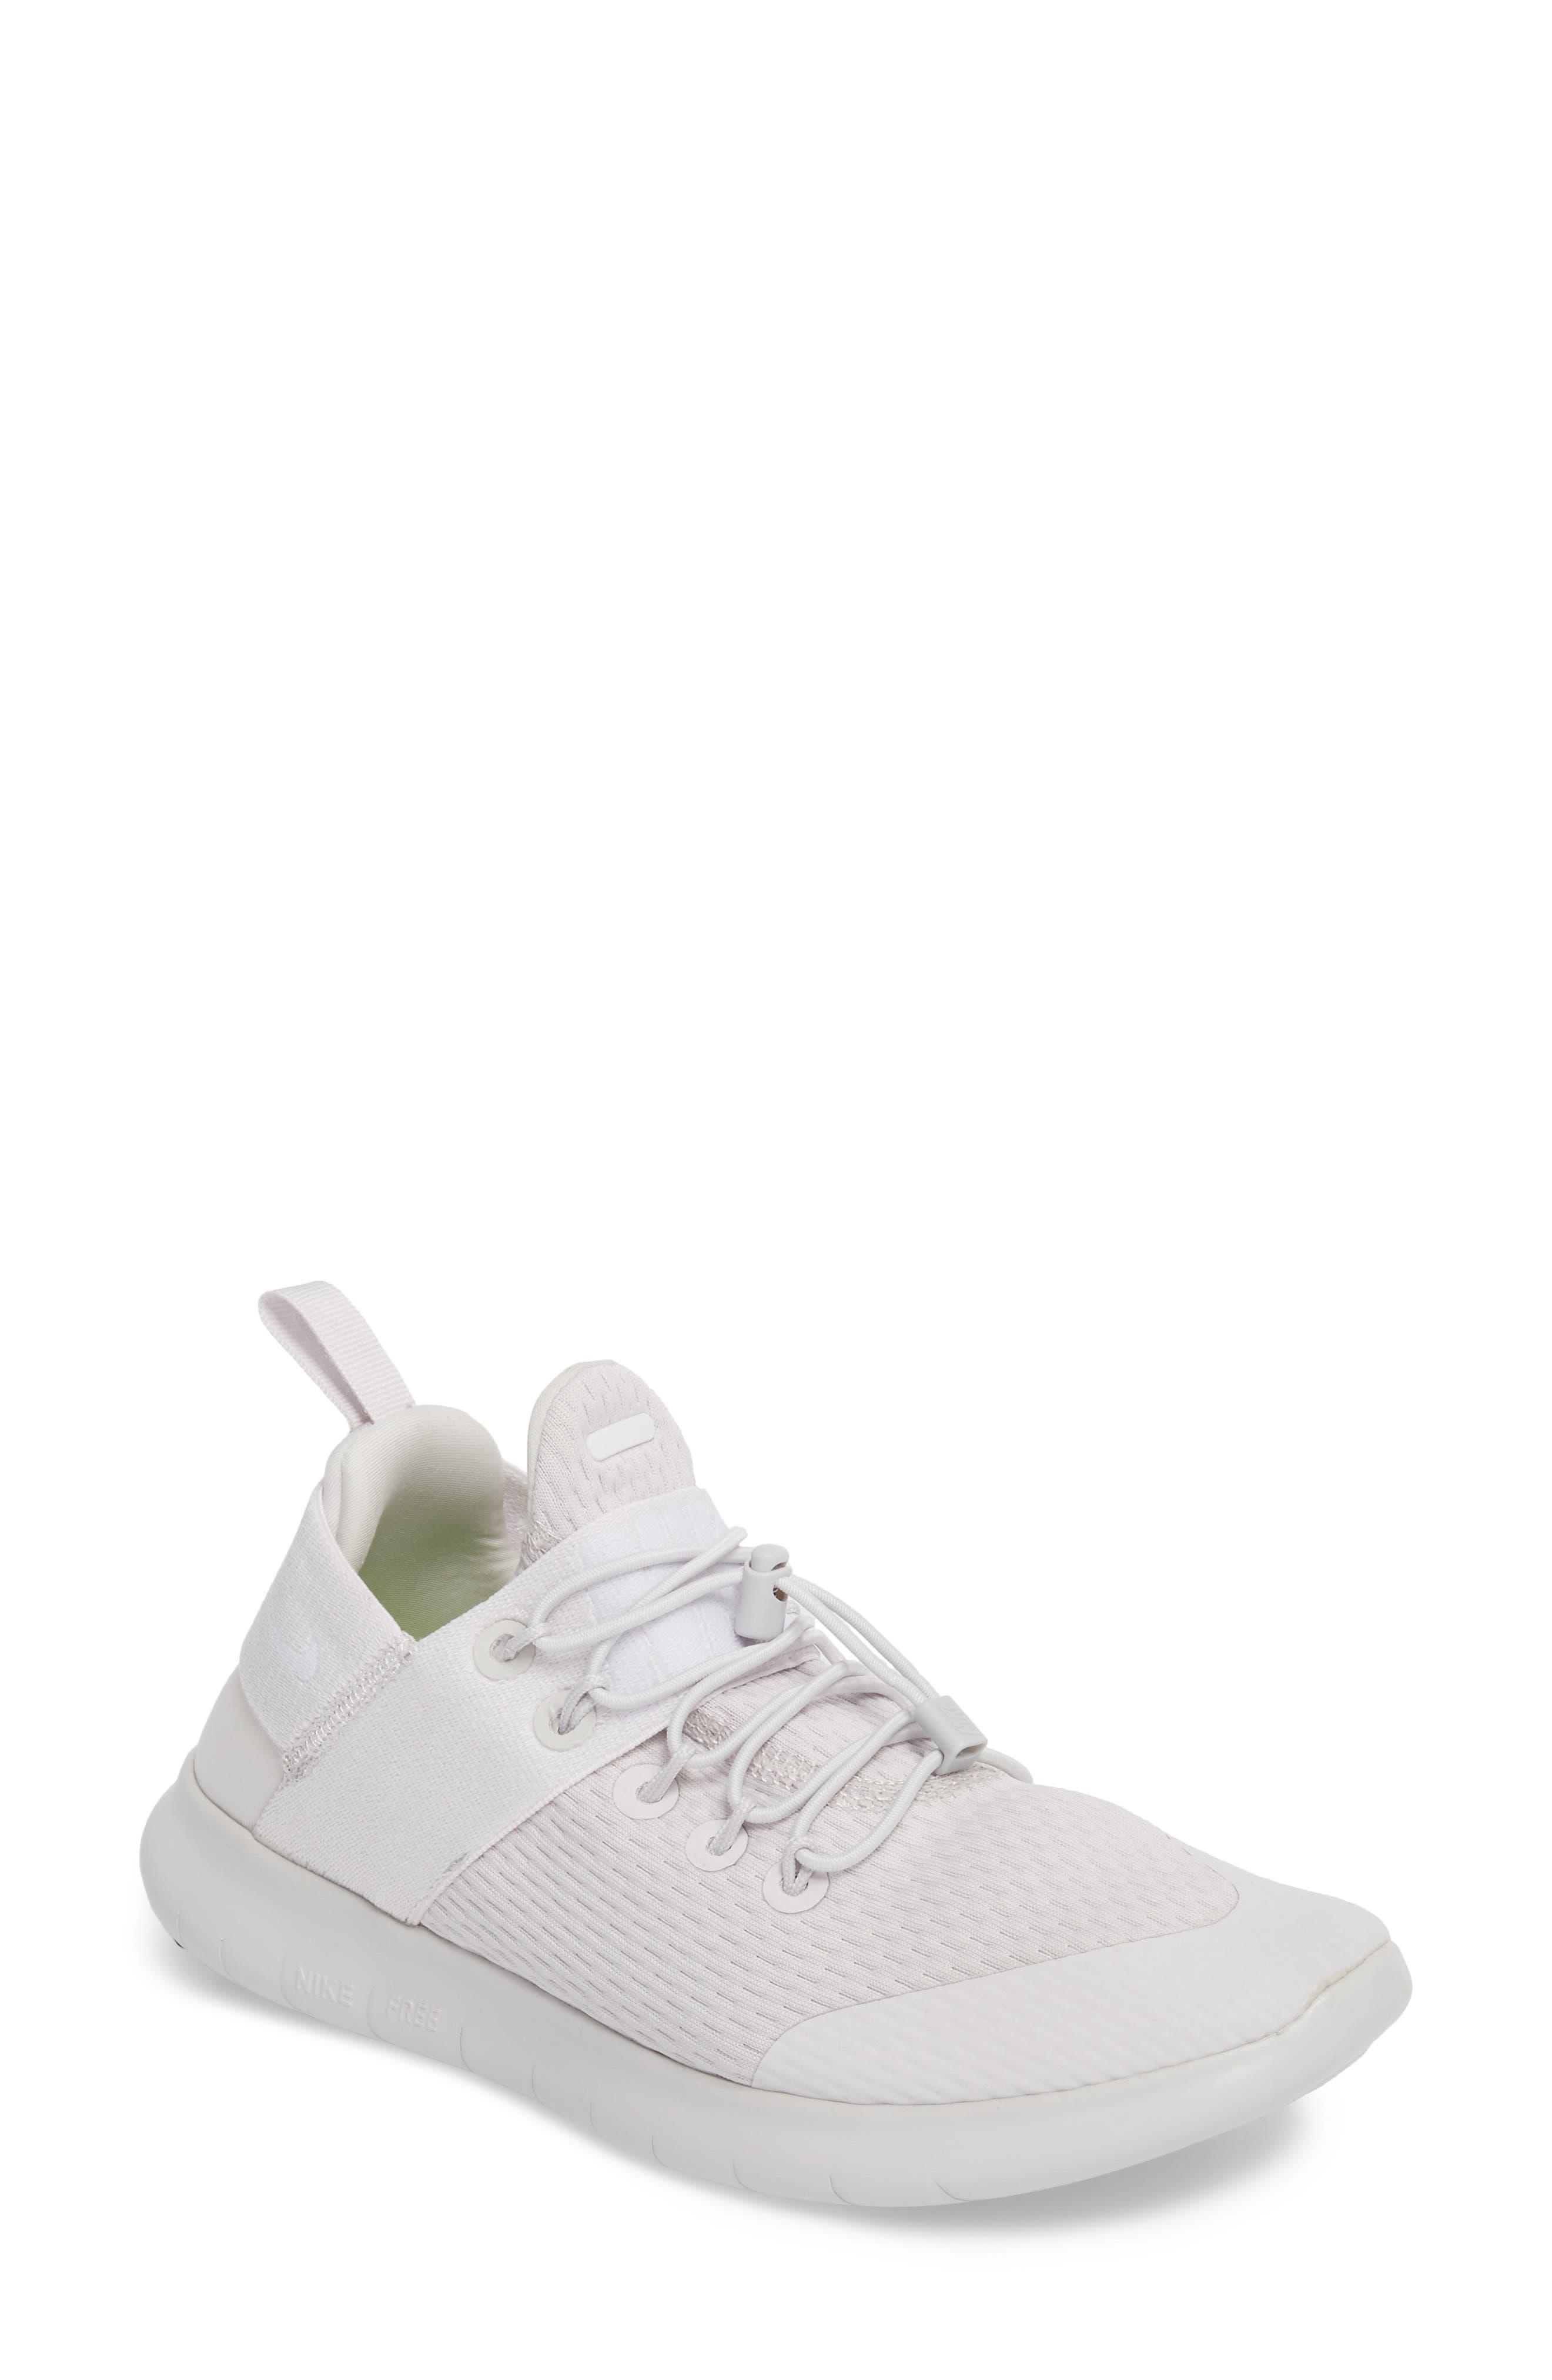 Alternate Image 1 Selected - Nike Free RN CMTR Running Shoe (Women)